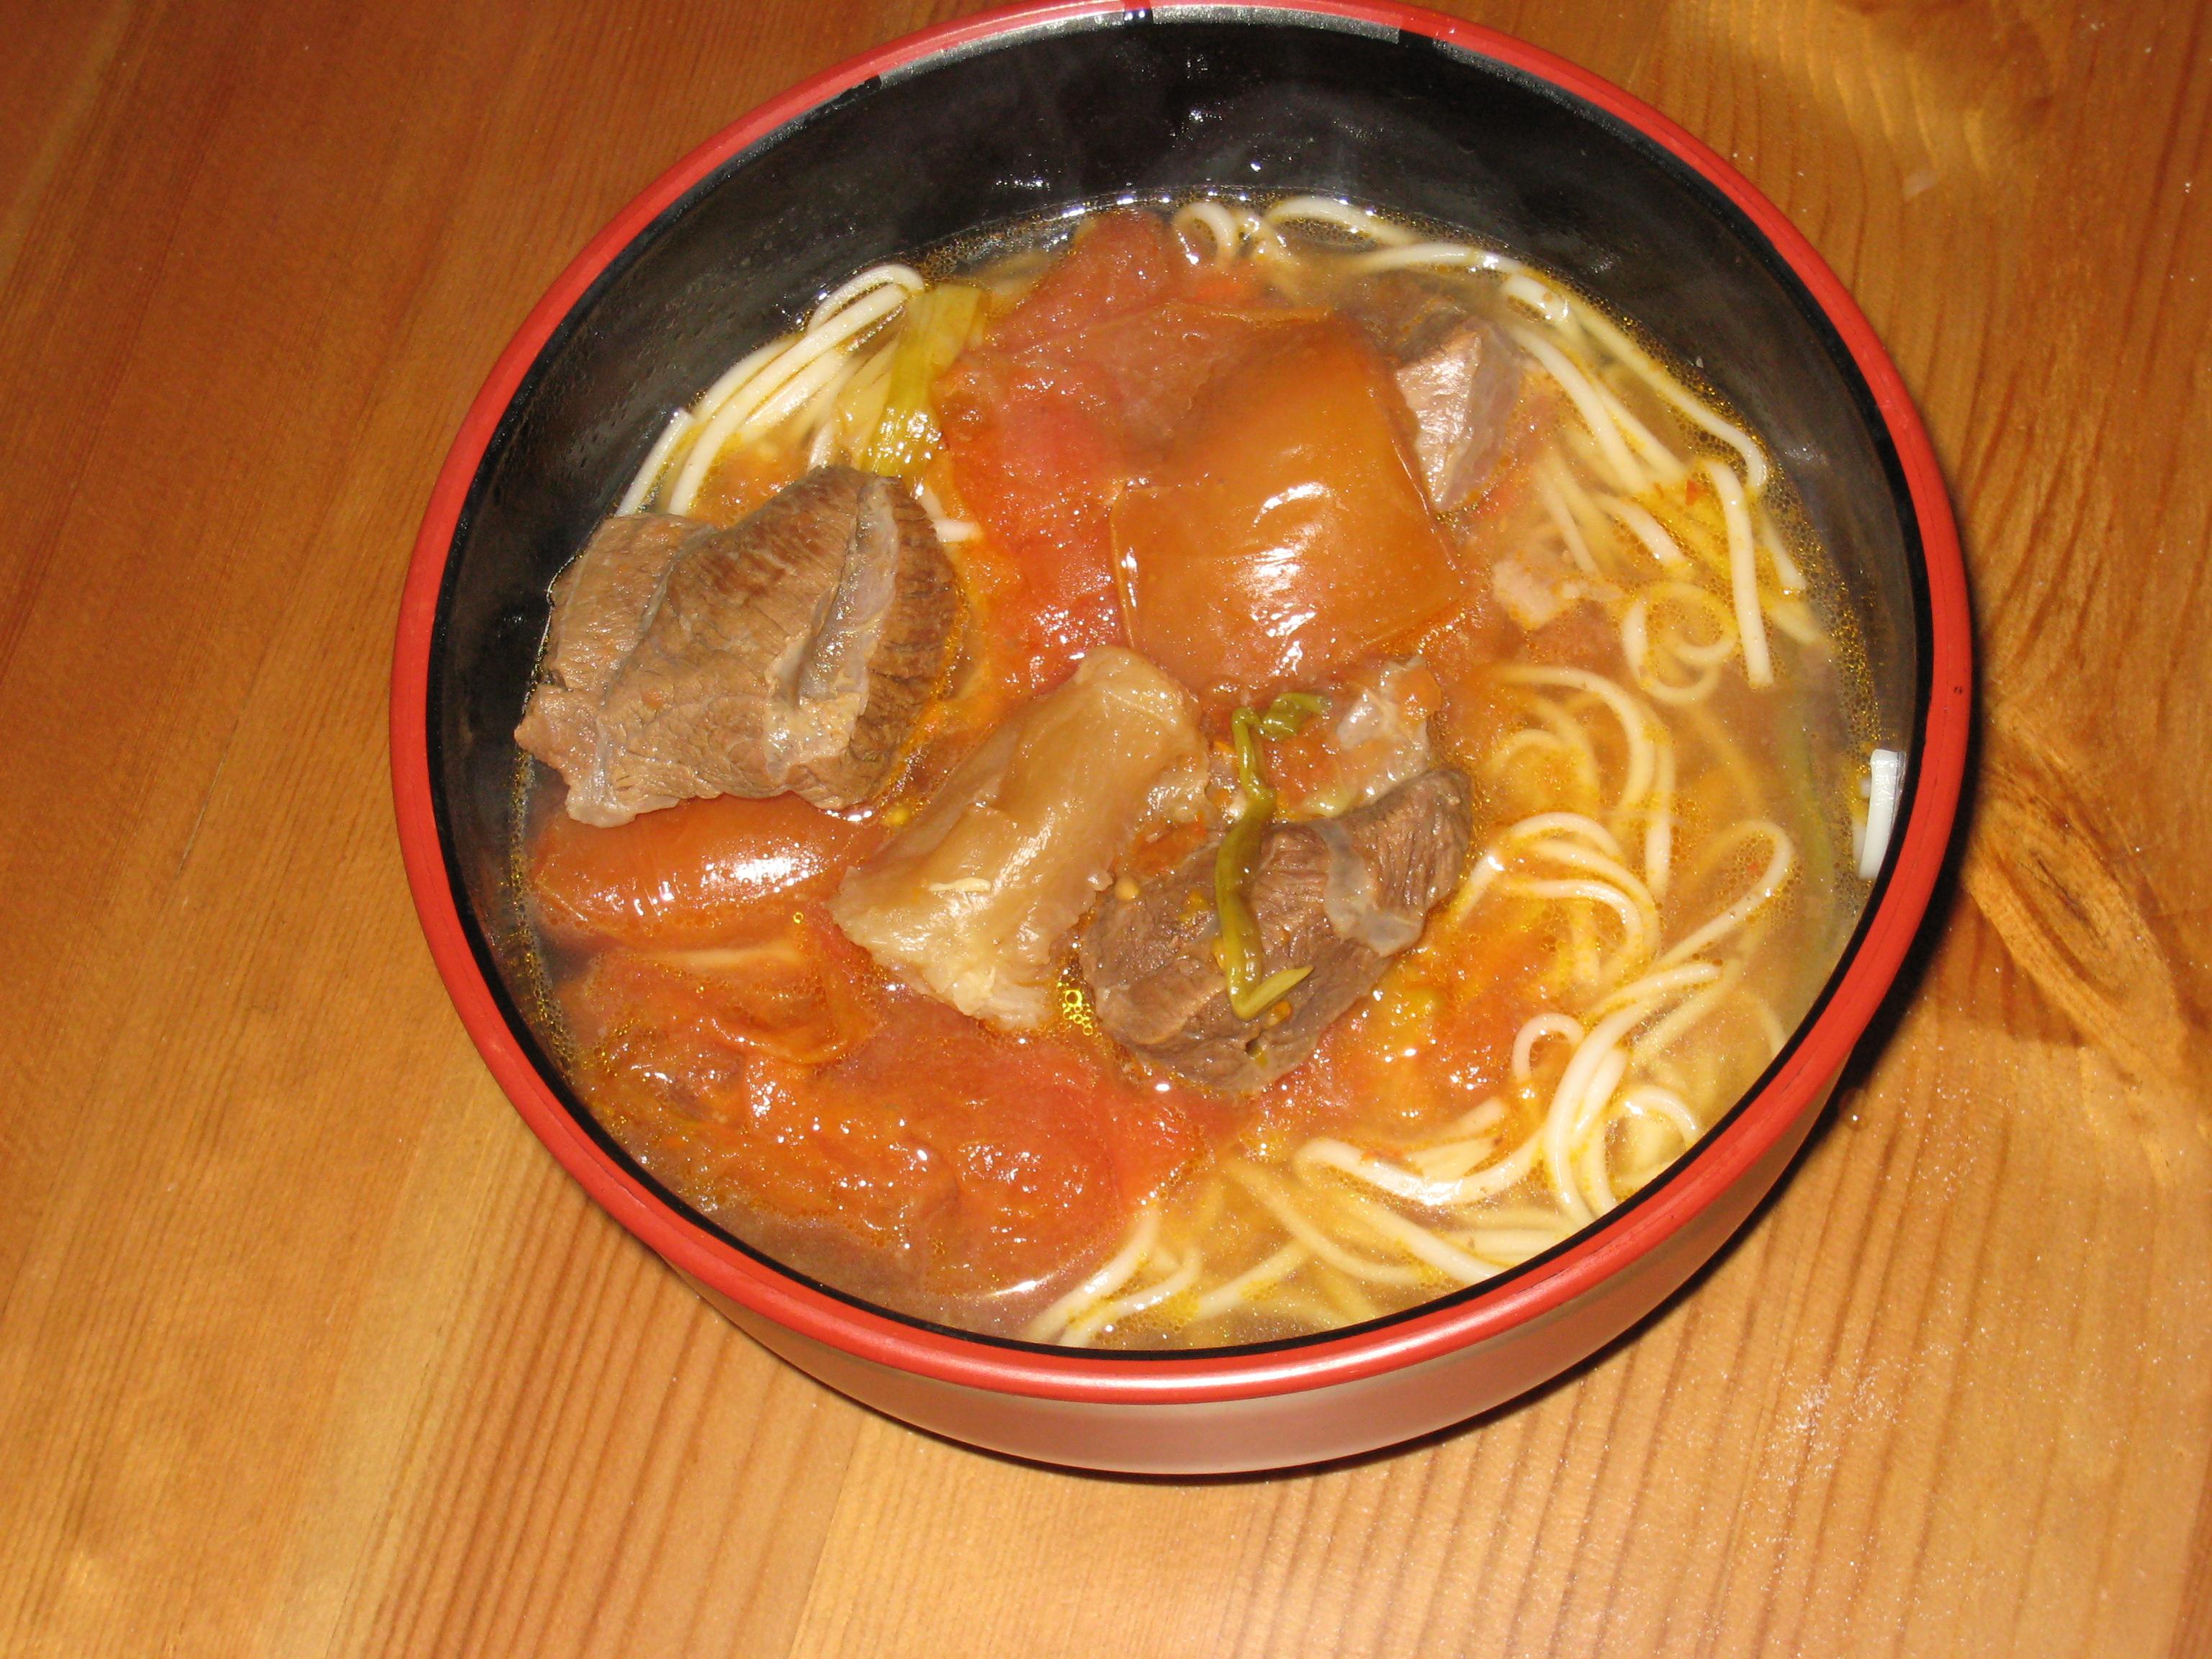 Taiwanese Beef Noodle Soup 2-Way (蕃茄牛肉麵/ 紅燒牛肉麵) | Life, Food